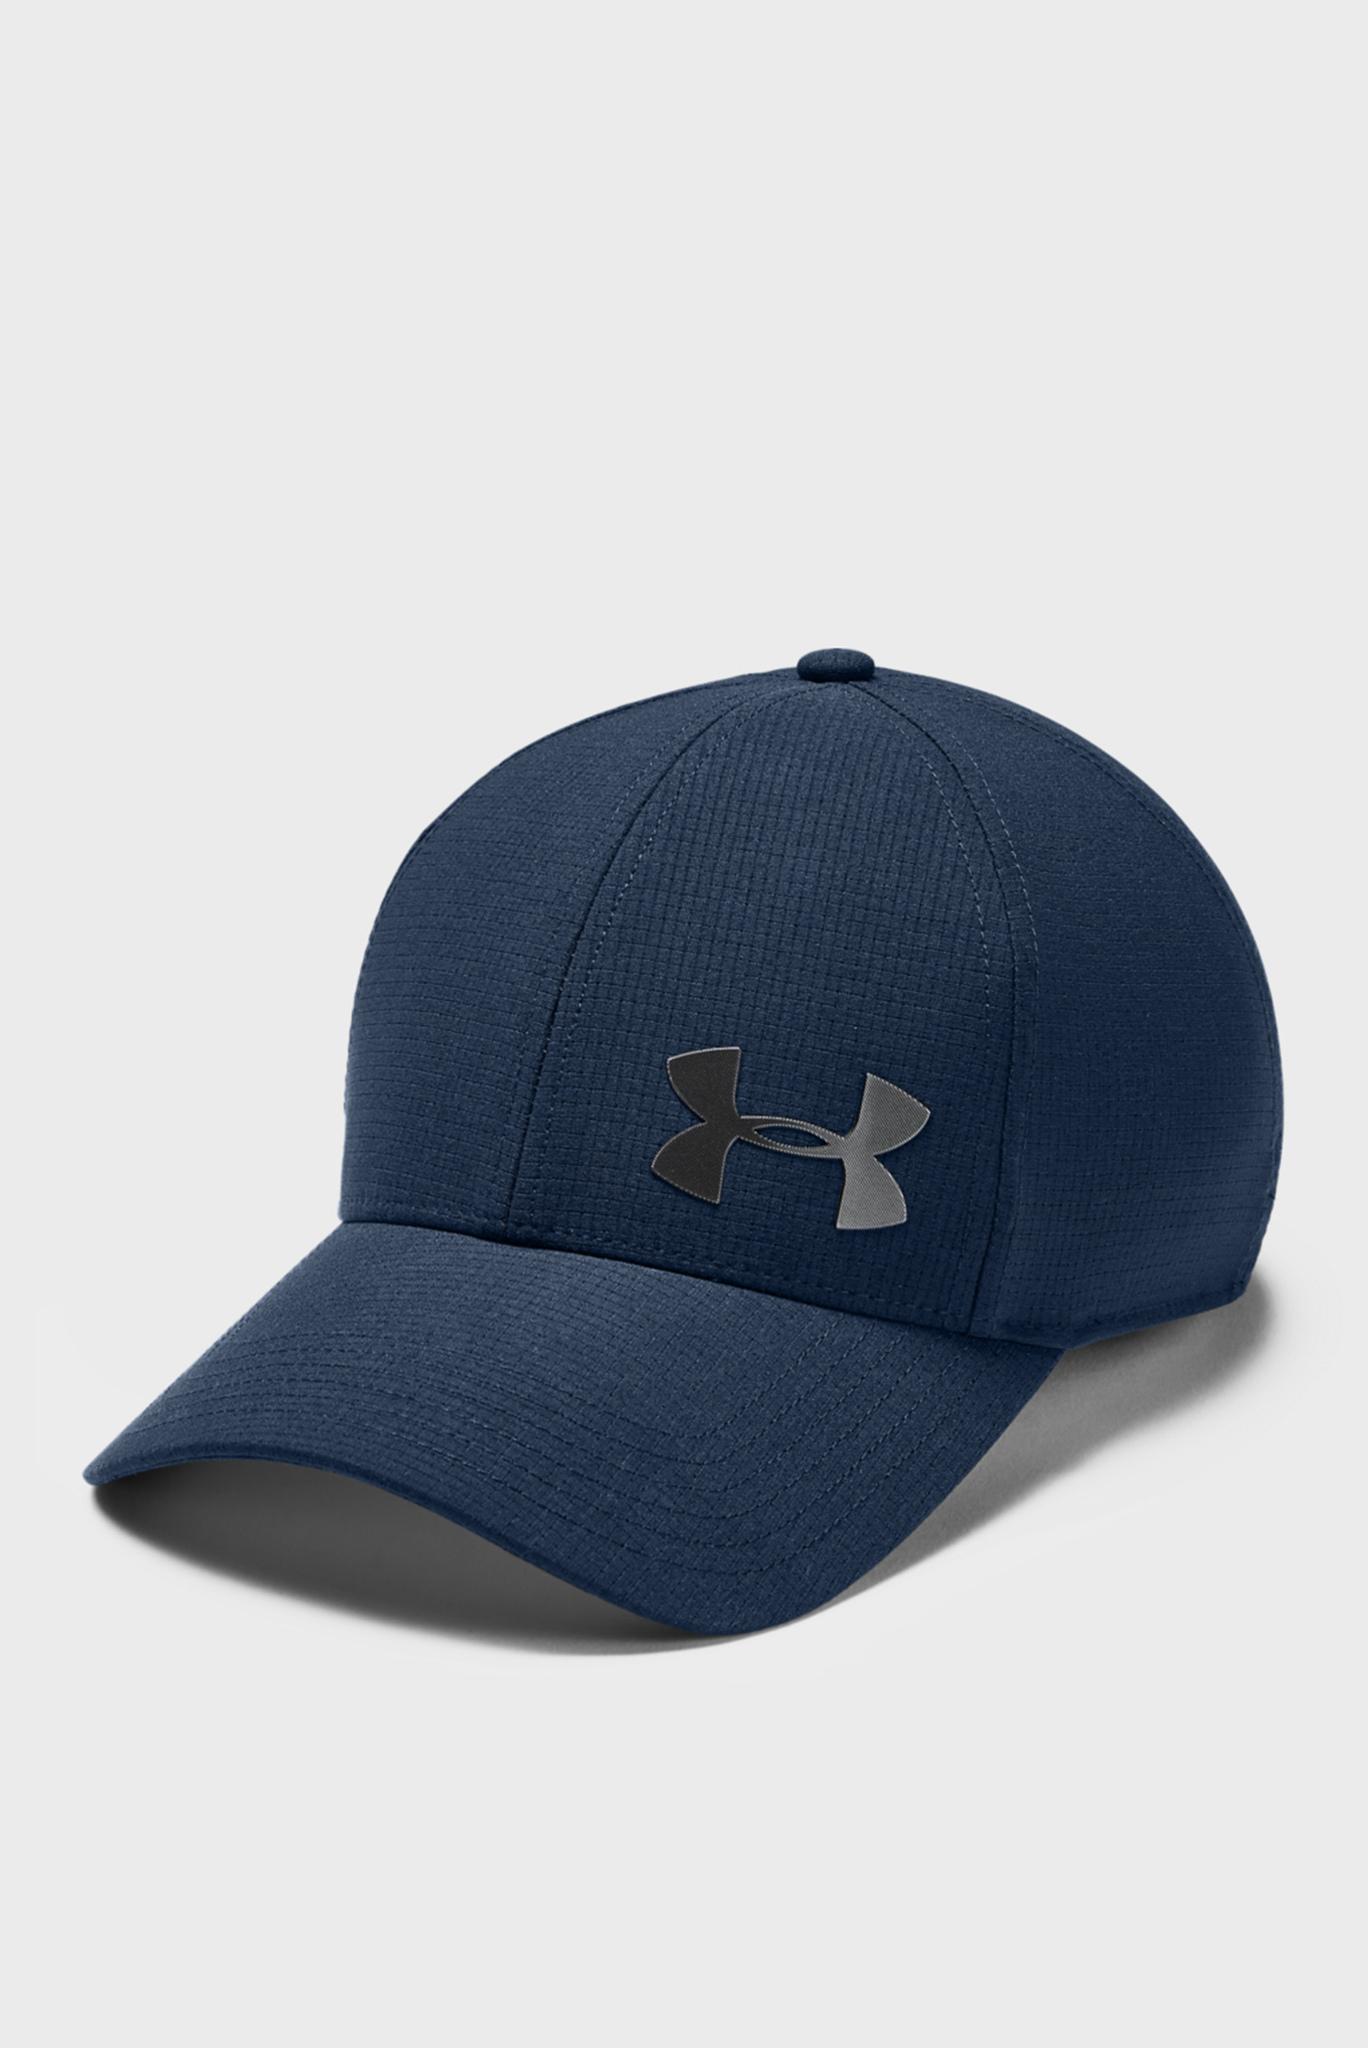 Мужская синяя кепка  UA Men's Airvent Core Cap 2.0-NVY Under Armour